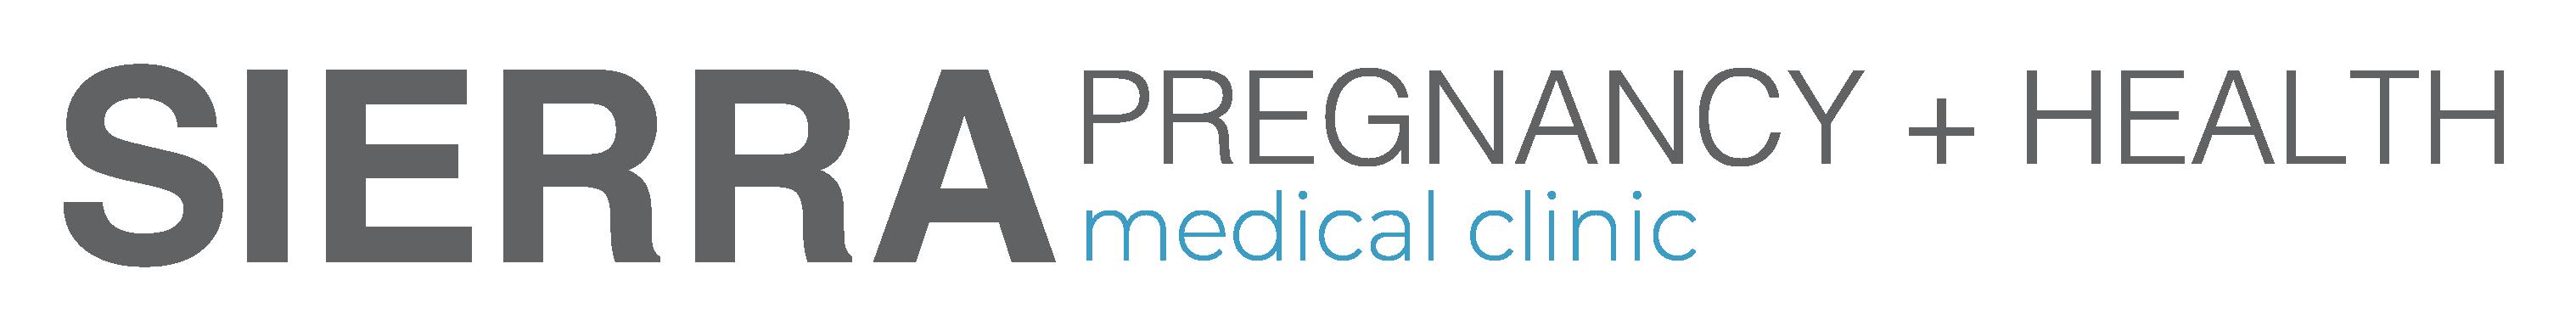 Sierra Pregnancy + Health